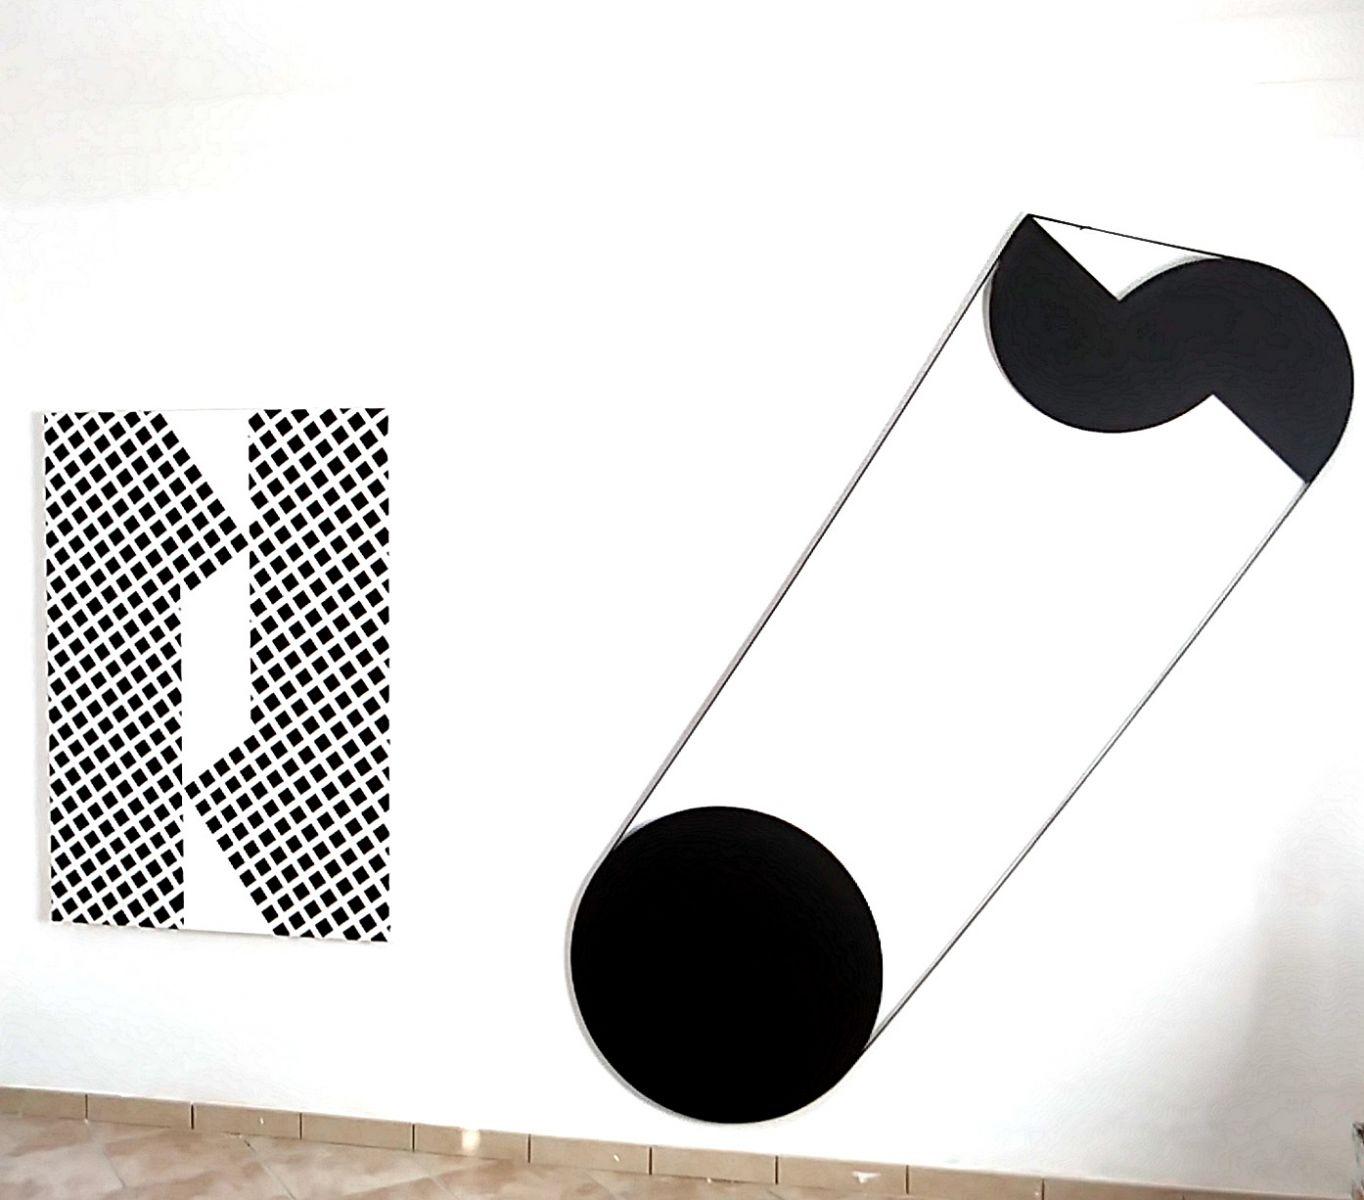 Raum-christian eder-illmitz-studio